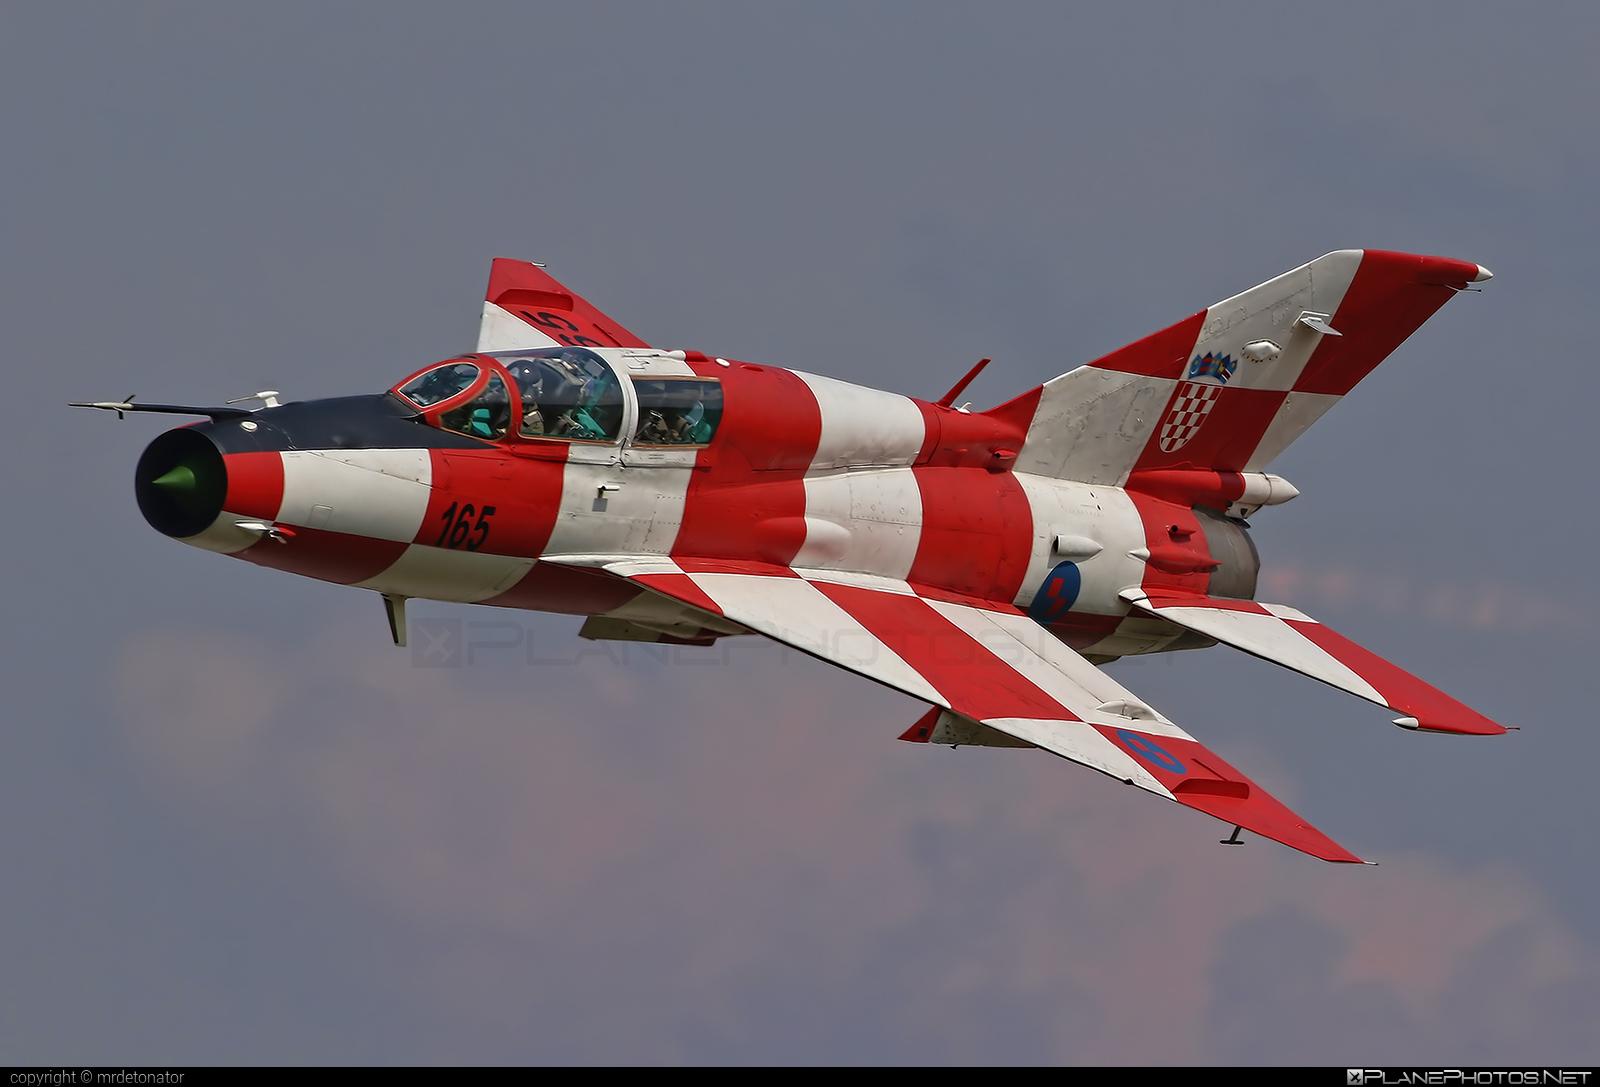 Mikoyan-Gurevich MiG-21UM - 165 operated by Hrvatsko ratno zrakoplovstvo i protuzračna obrana (Croatian Air Force) #mig #mig21 #mig21um #mikoyangurevich